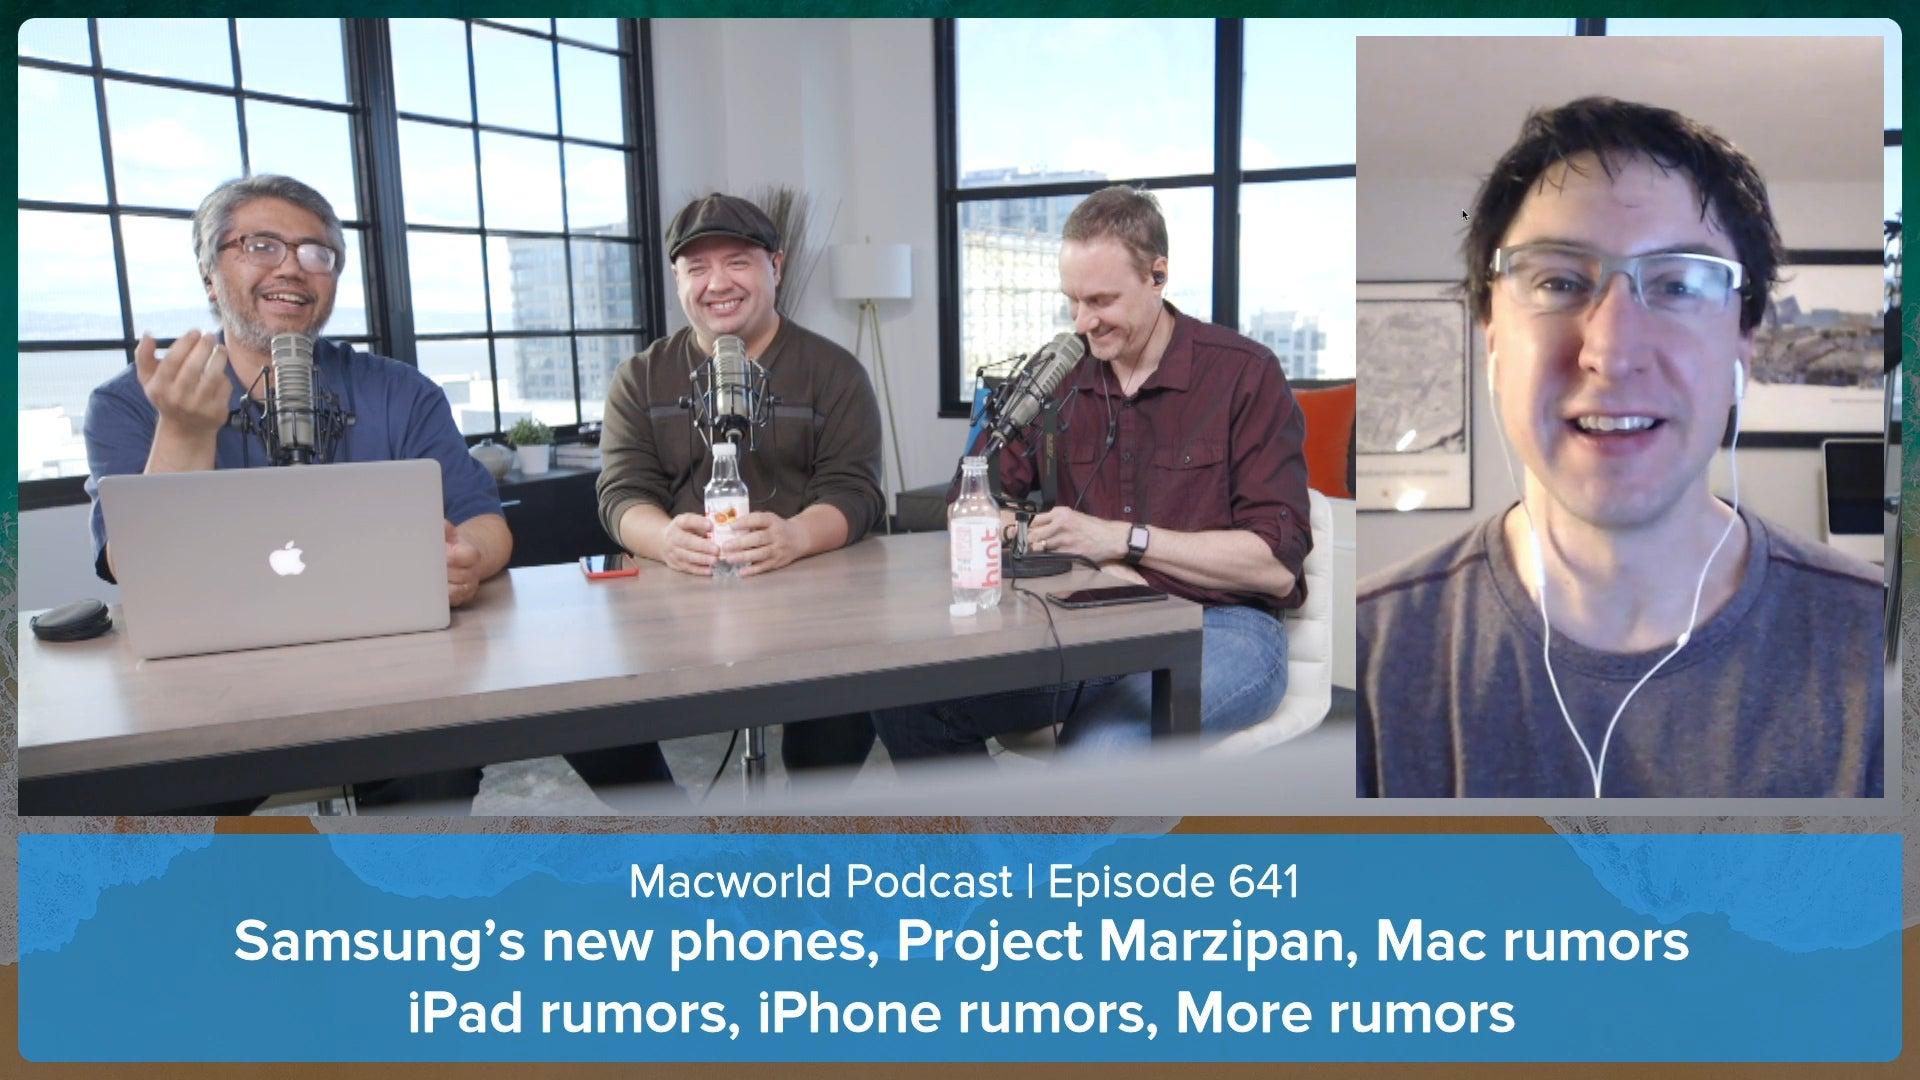 Macworld Podcast 641